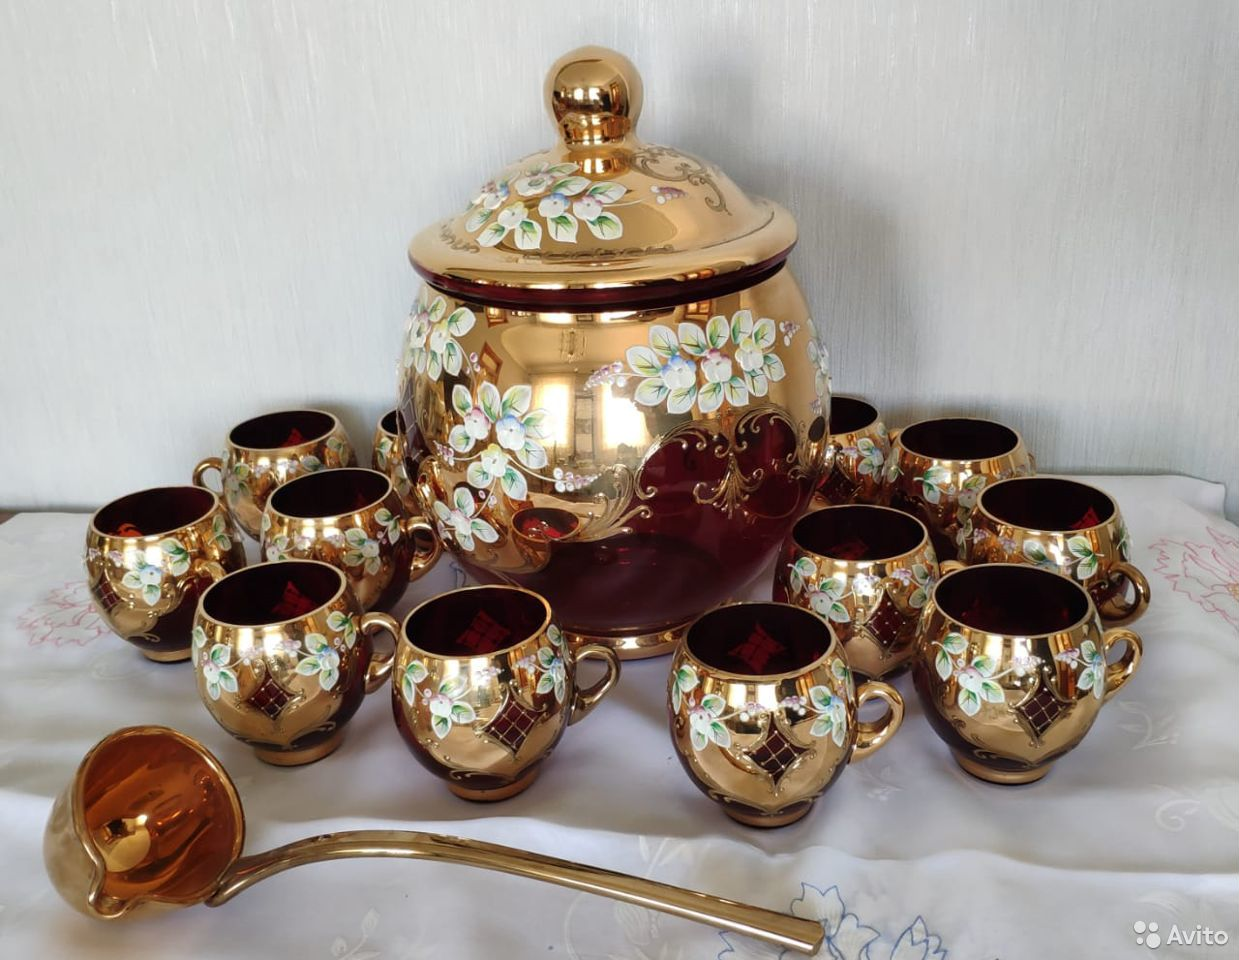 Крюшонница, 12 чашек, половник, лепка